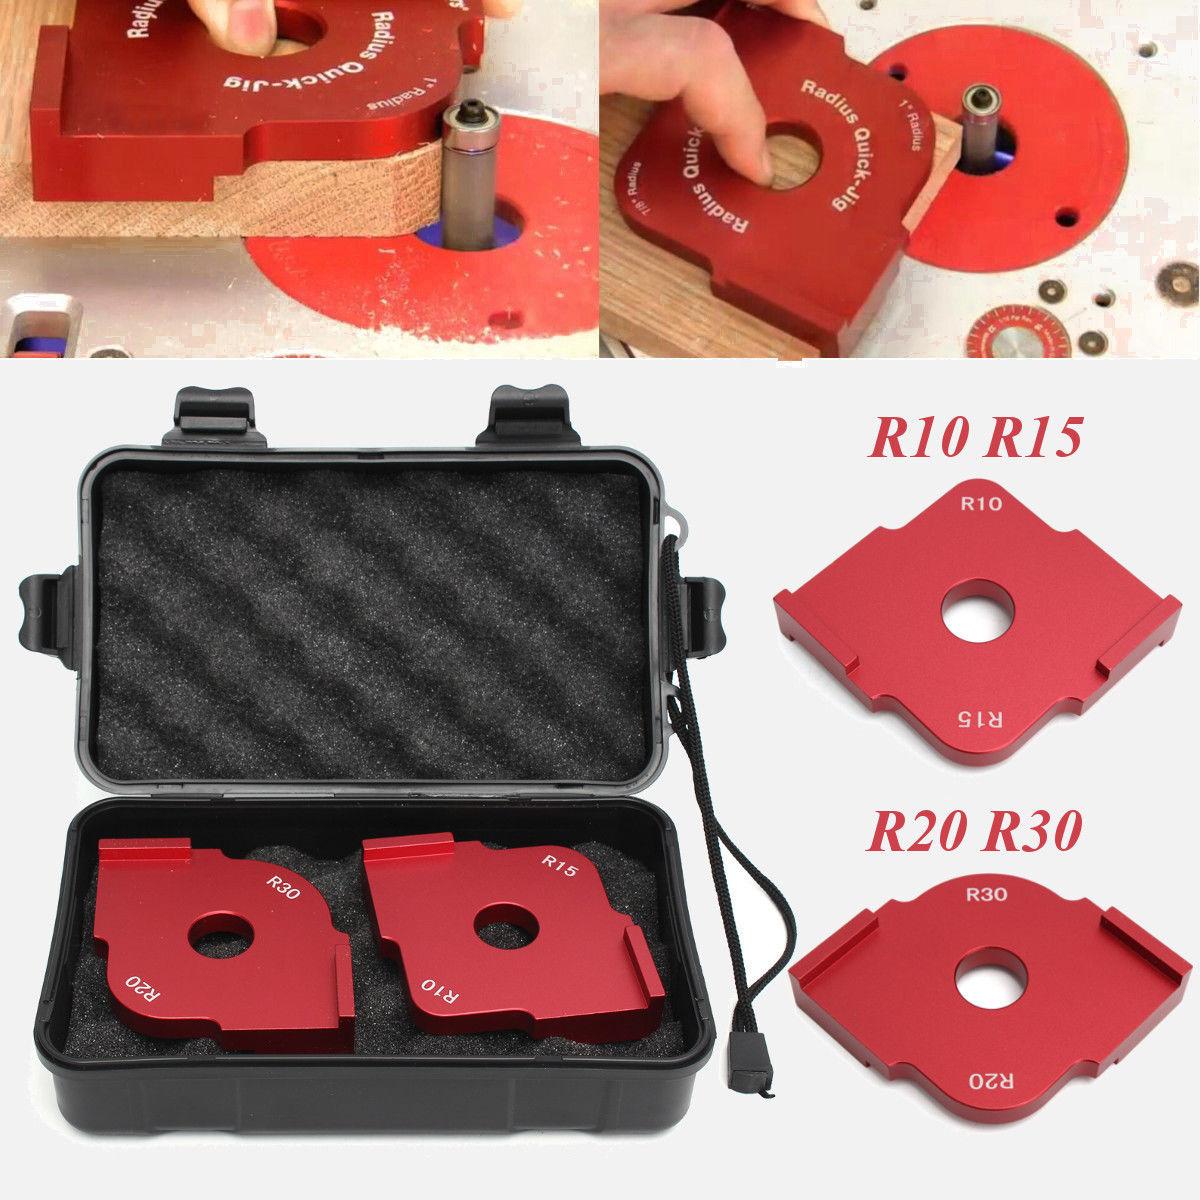 Wood Radius Quick Jig Router Table Corner Template R10 R15 + R20 R30 + Box ToolWood Radius Quick Jig Router Table Corner Template R10 R15 + R20 R30 + Box Tool